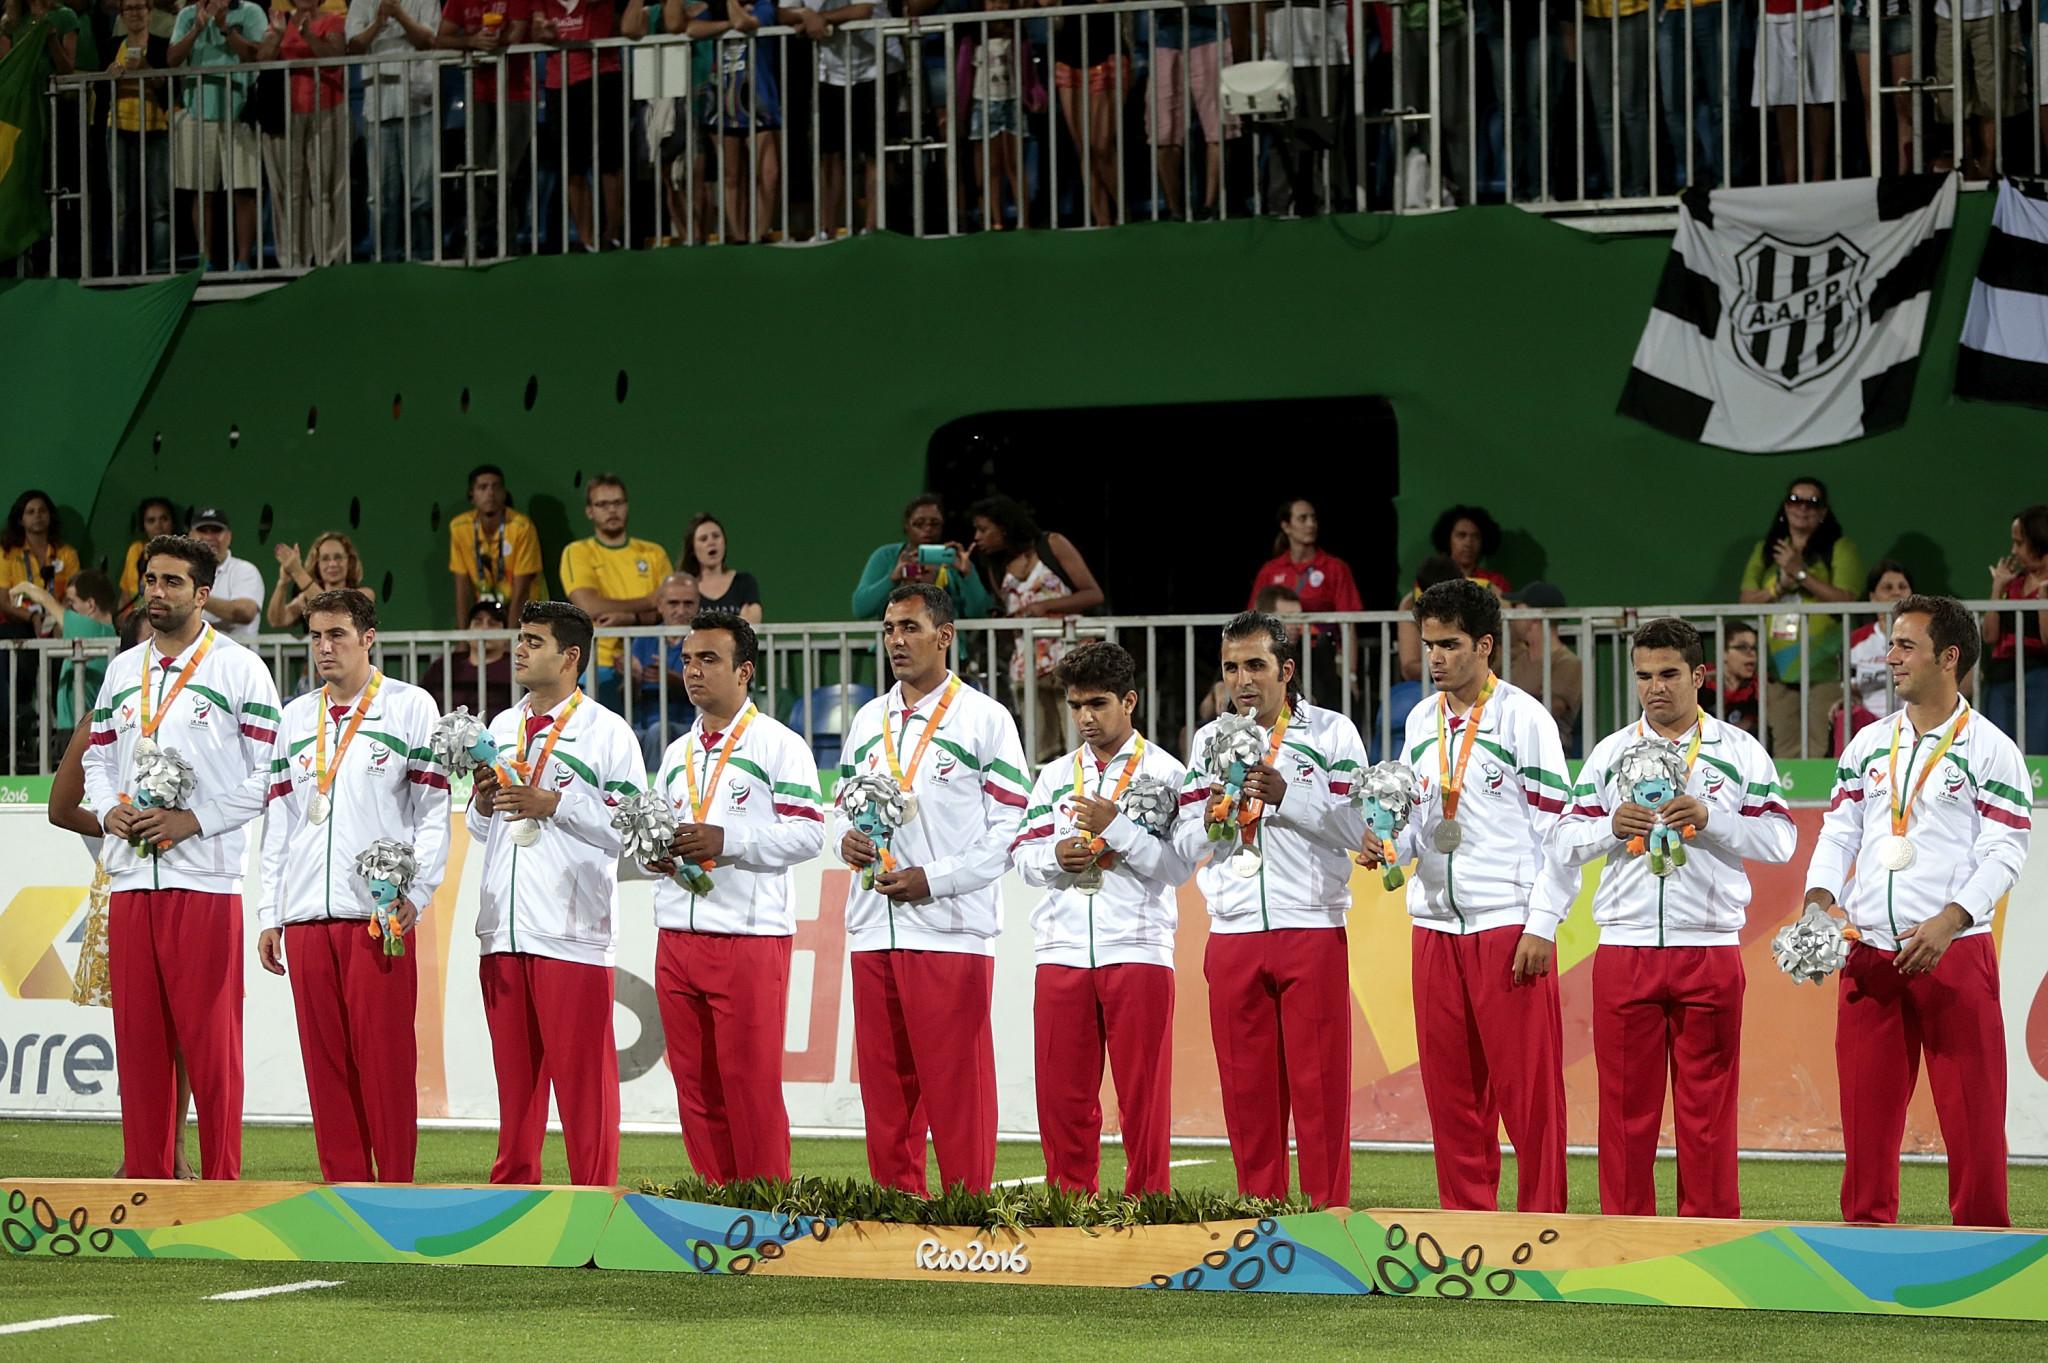 Iran won Paralympic silver at Rio 2016 ©Getty Images